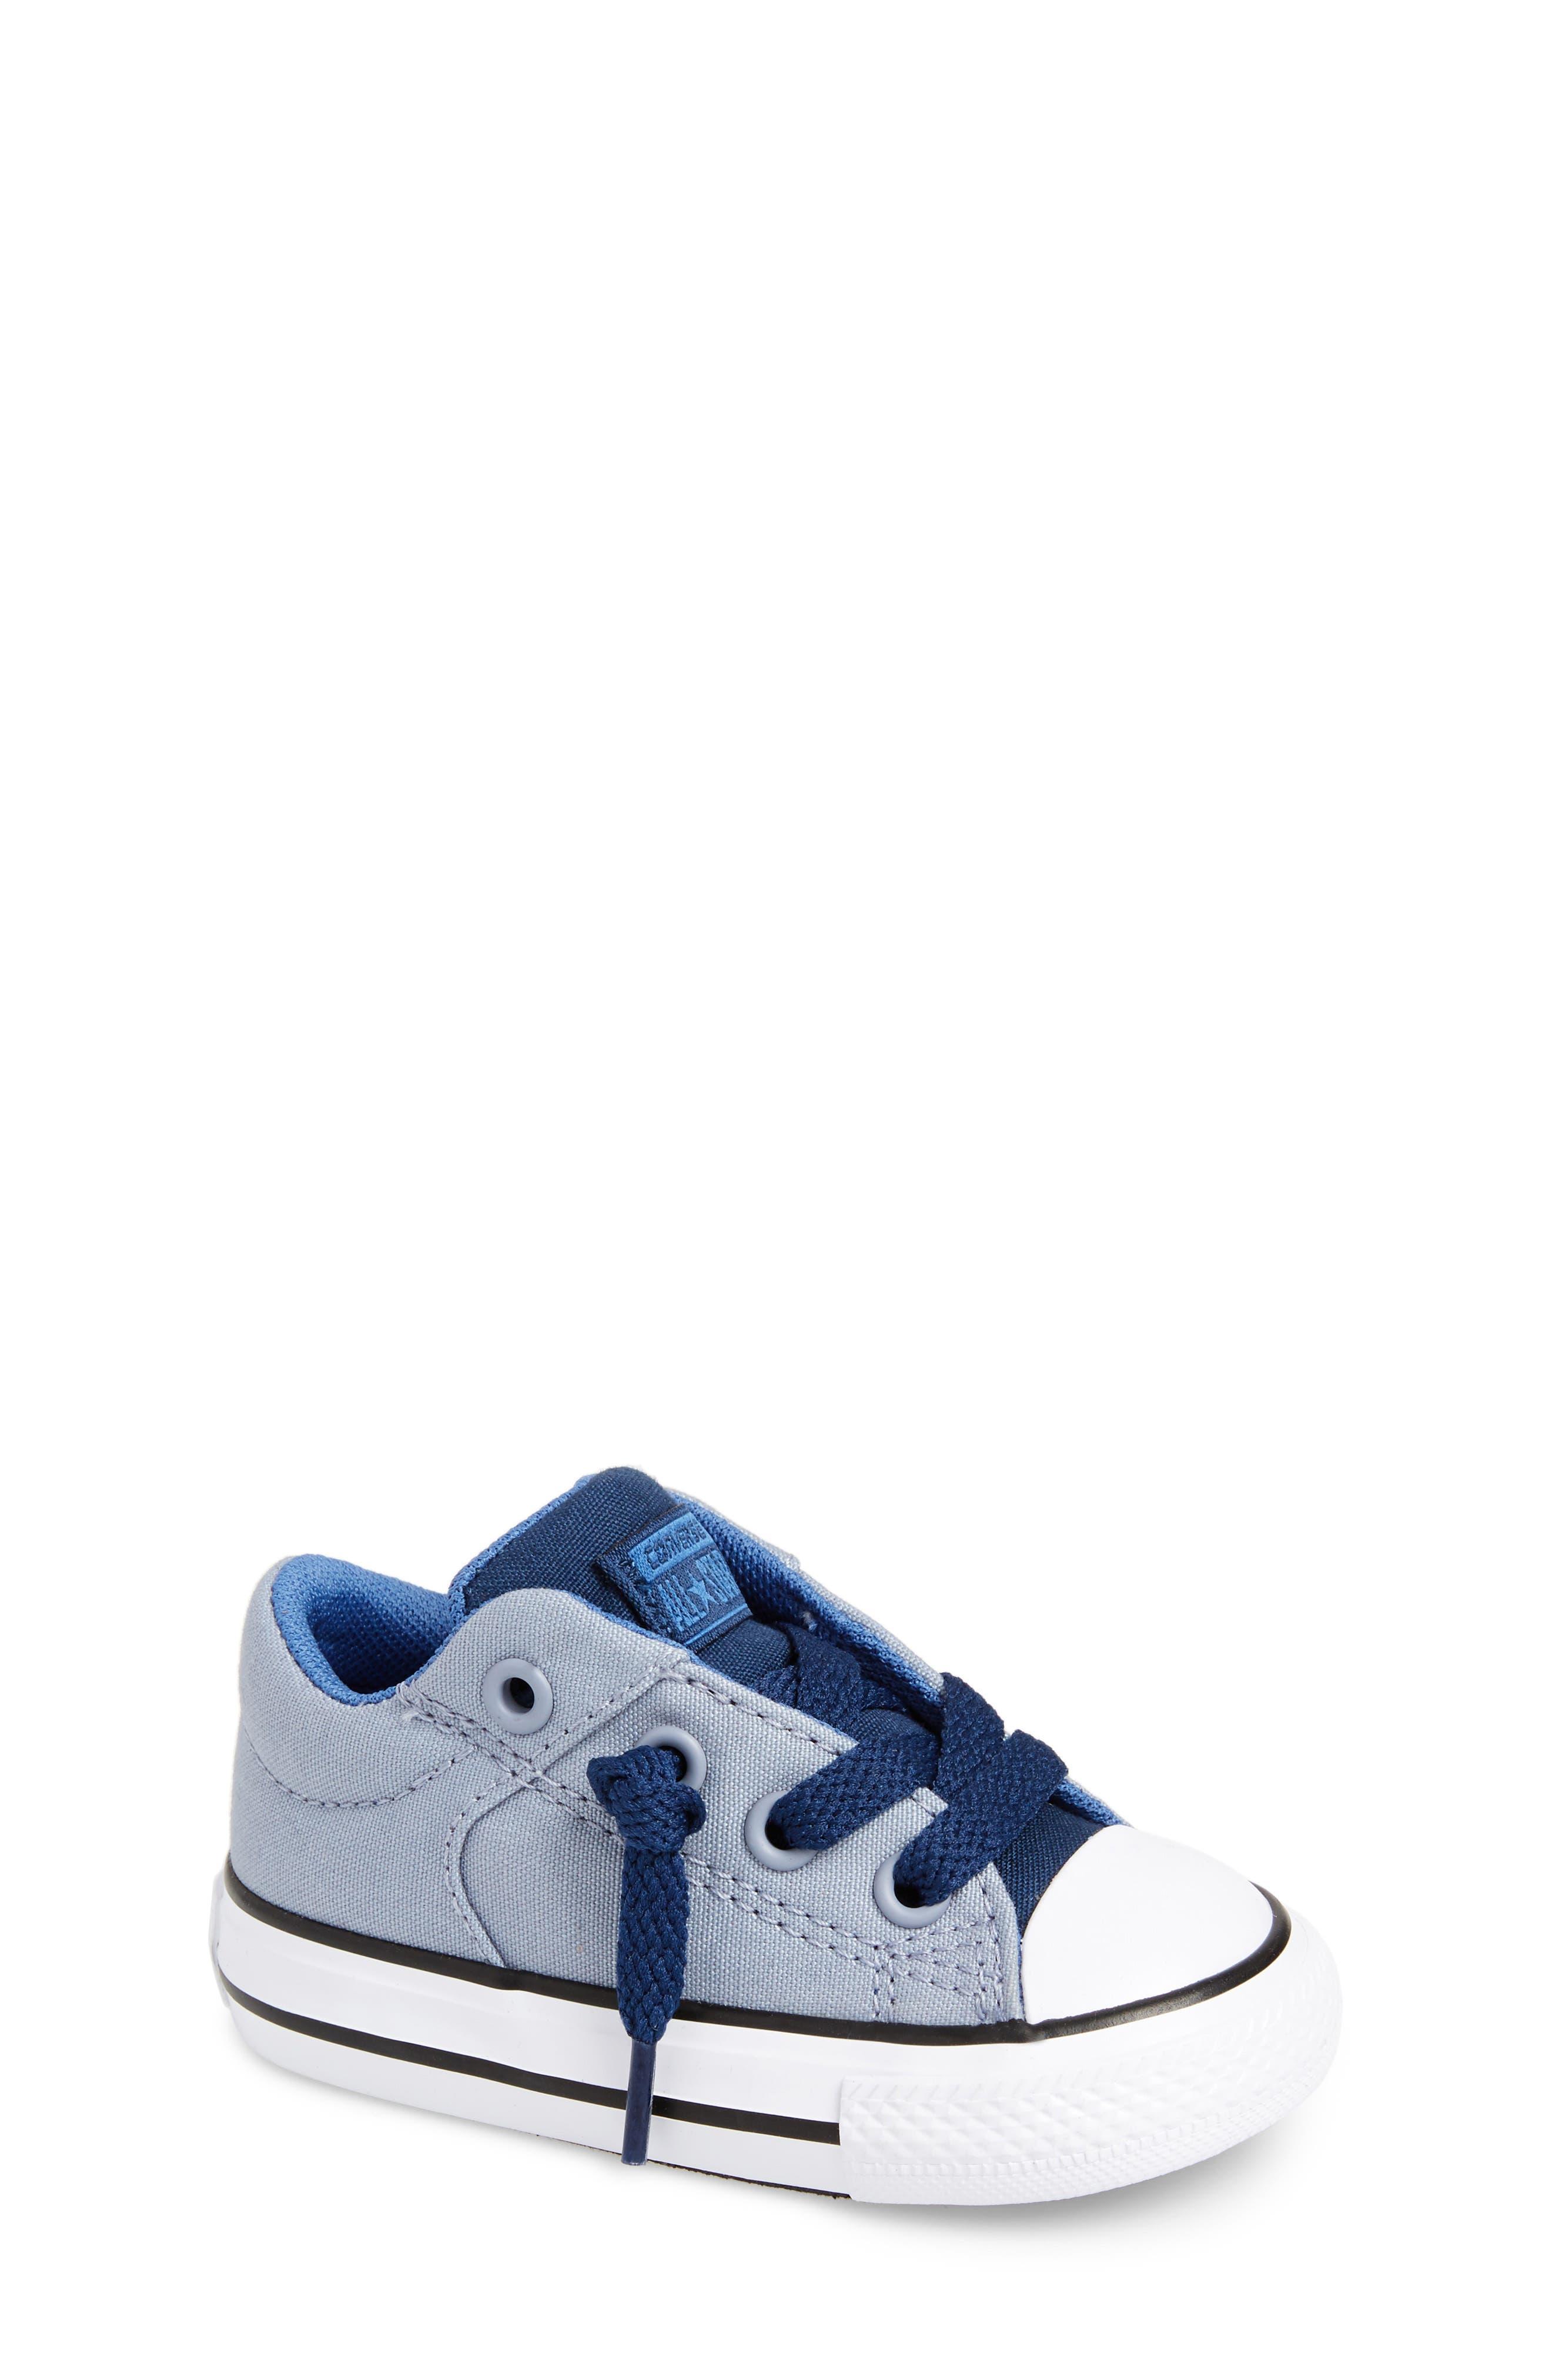 Chuck Taylor<sup>®</sup> All Star<sup>®</sup> High Street Slip-On Sneaker,                             Main thumbnail 1, color,                             Glacier Grey